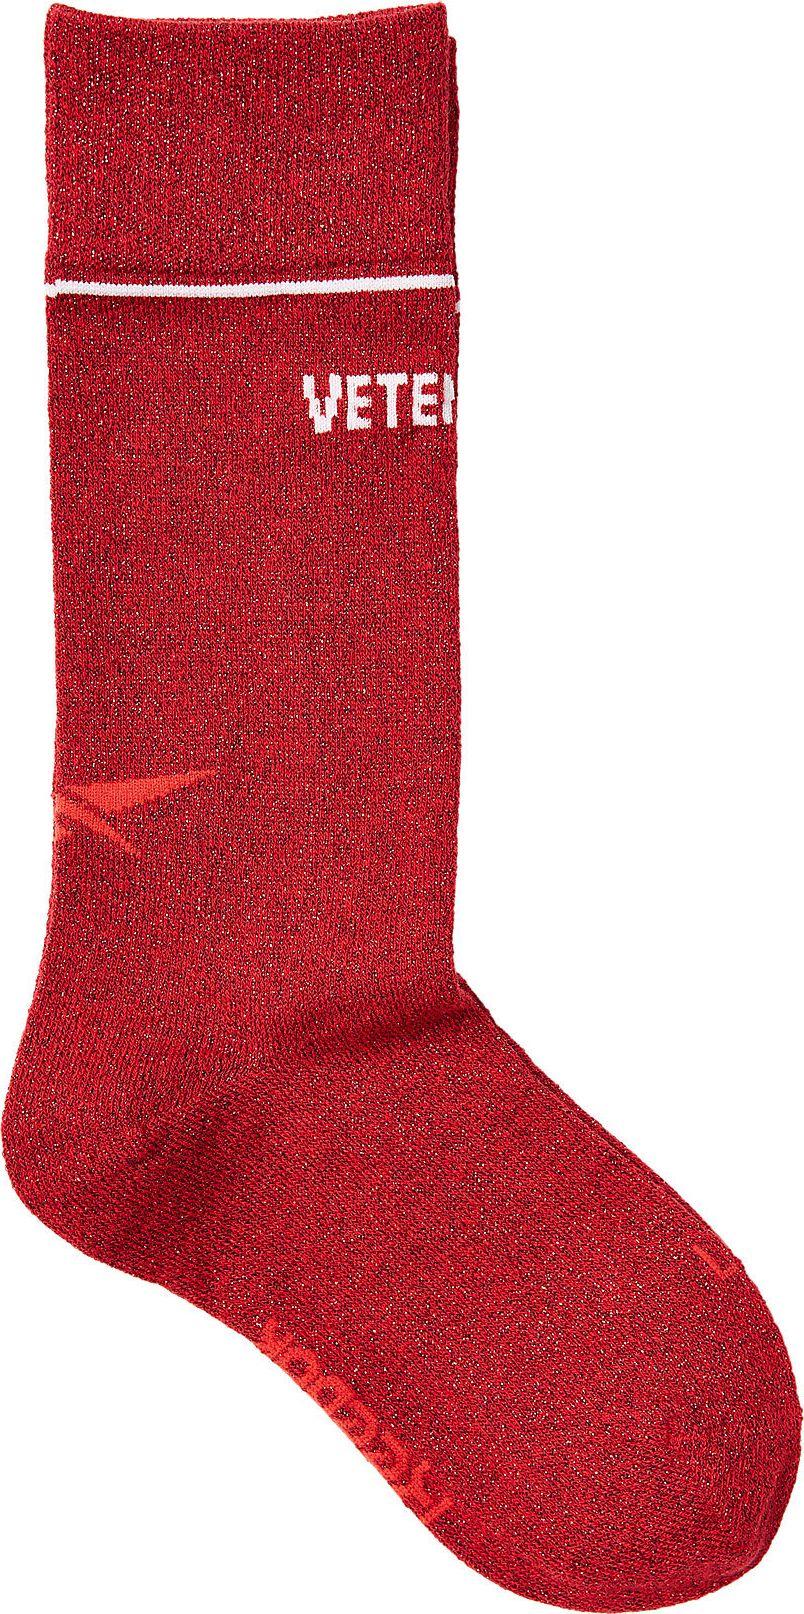 Vetements - X Reebok Printed Socks with Metallic Thread